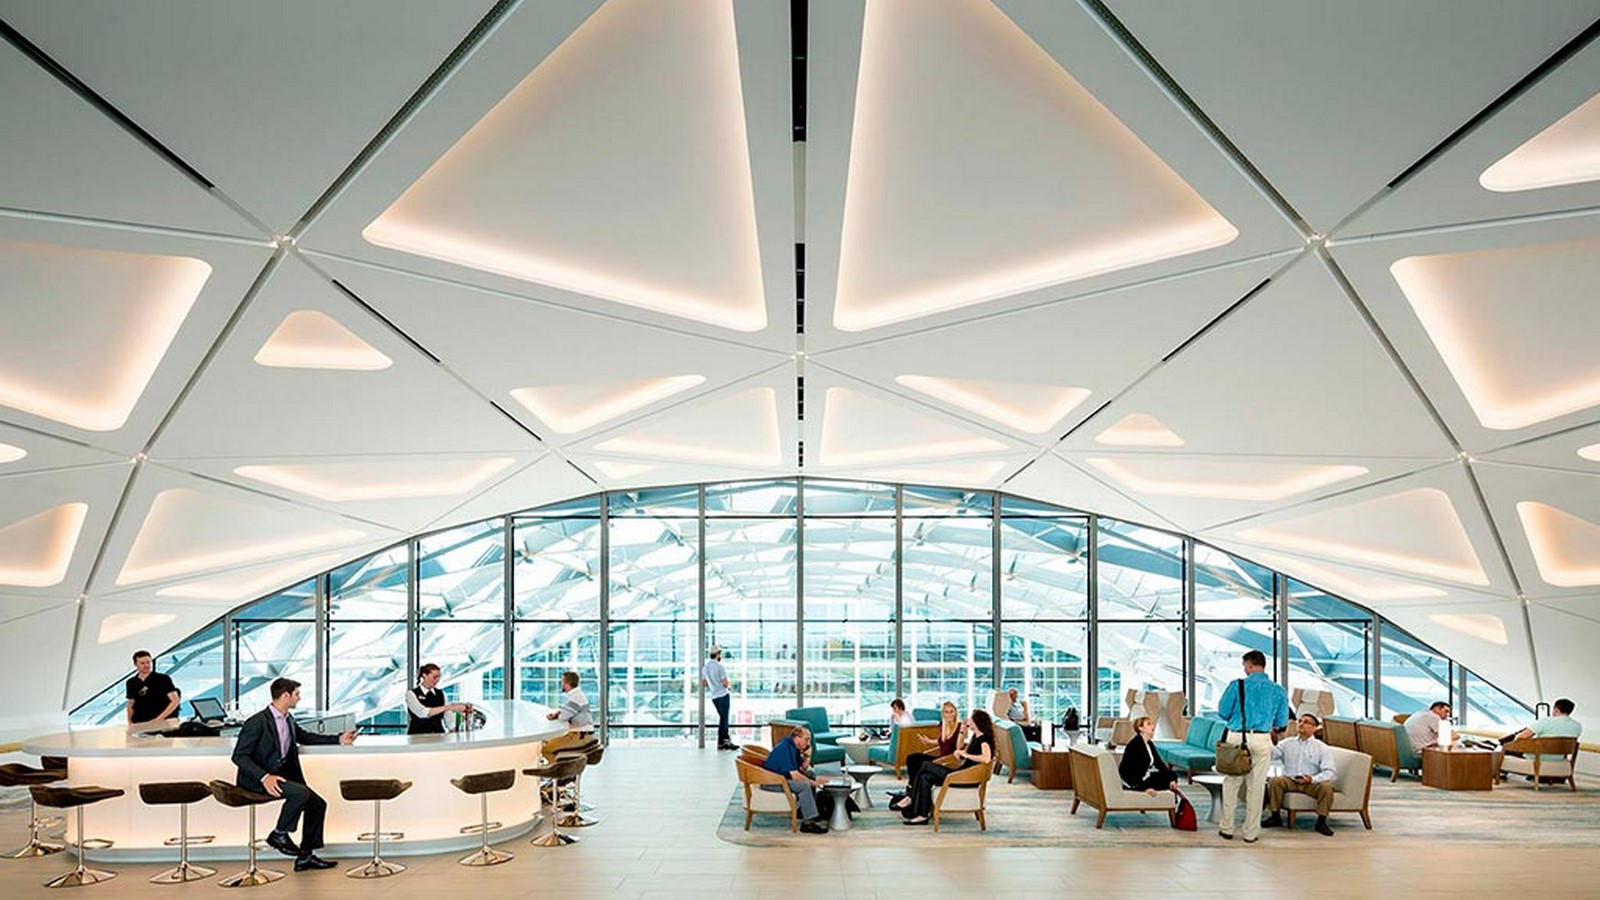 Westin DEN Hotel and Transit Center - Denver International Airport (DEN) - Sheet3